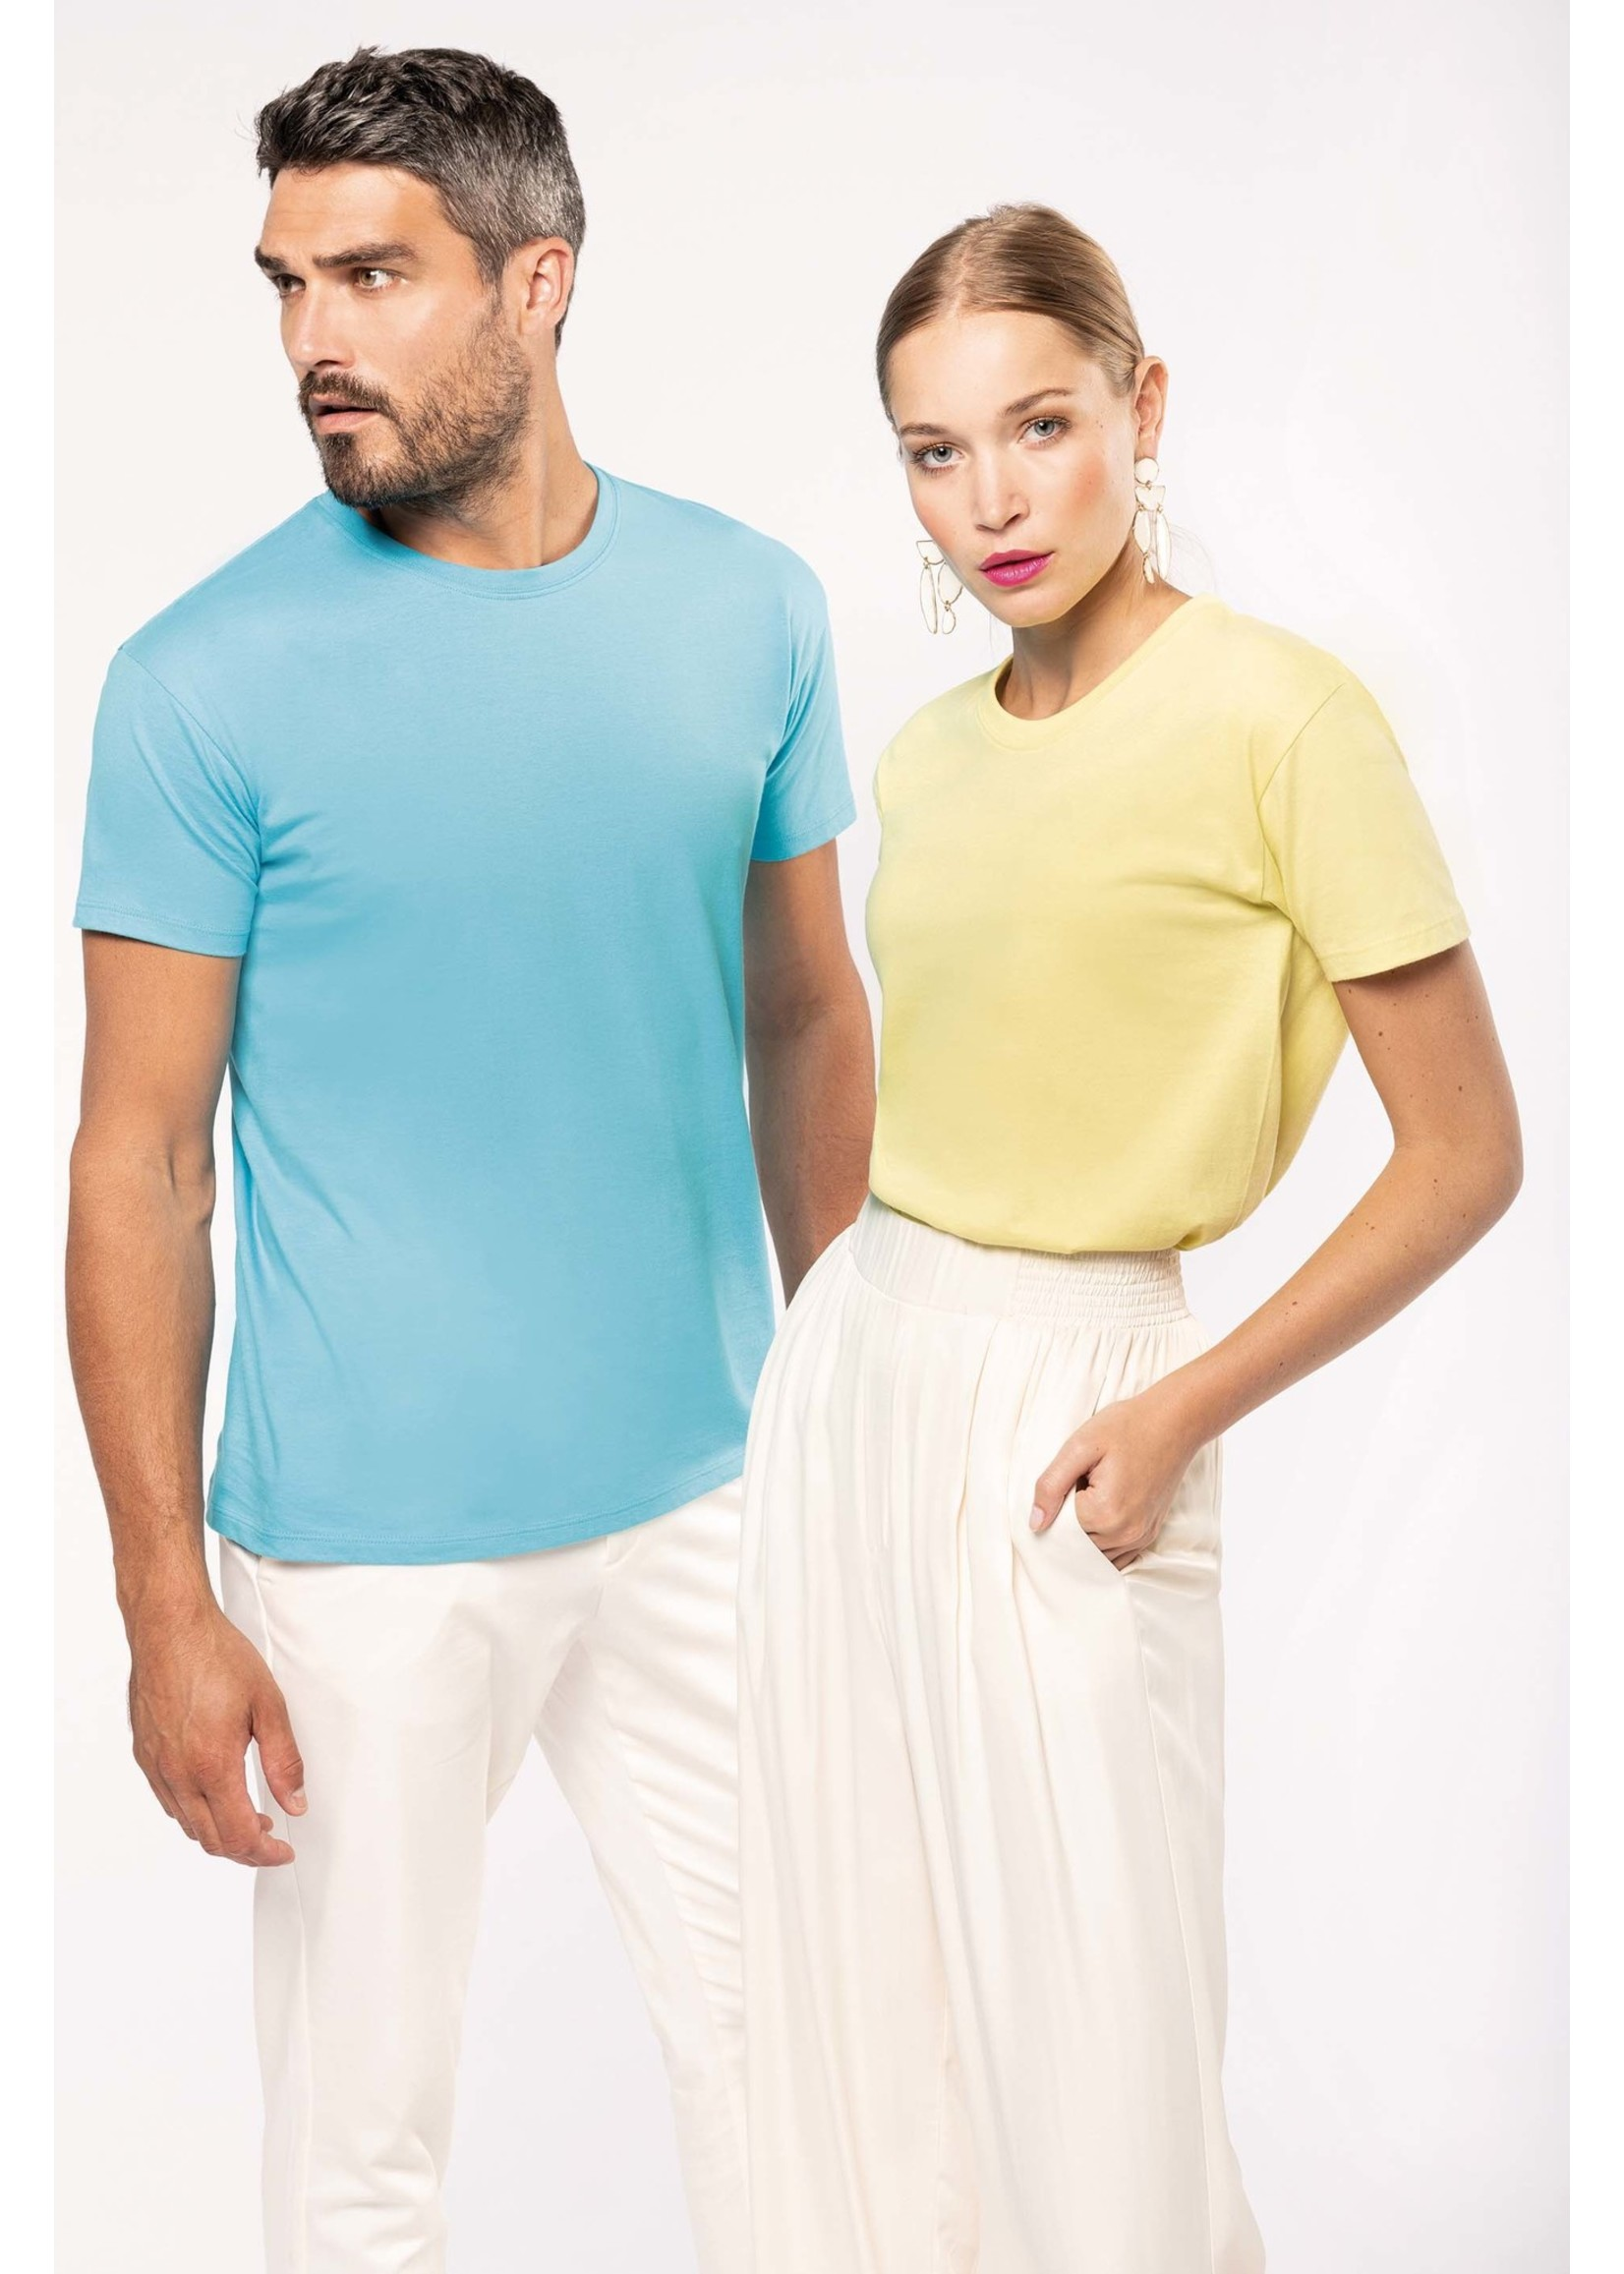 Eco-Friendly Unisex T-shirt - Navyblue